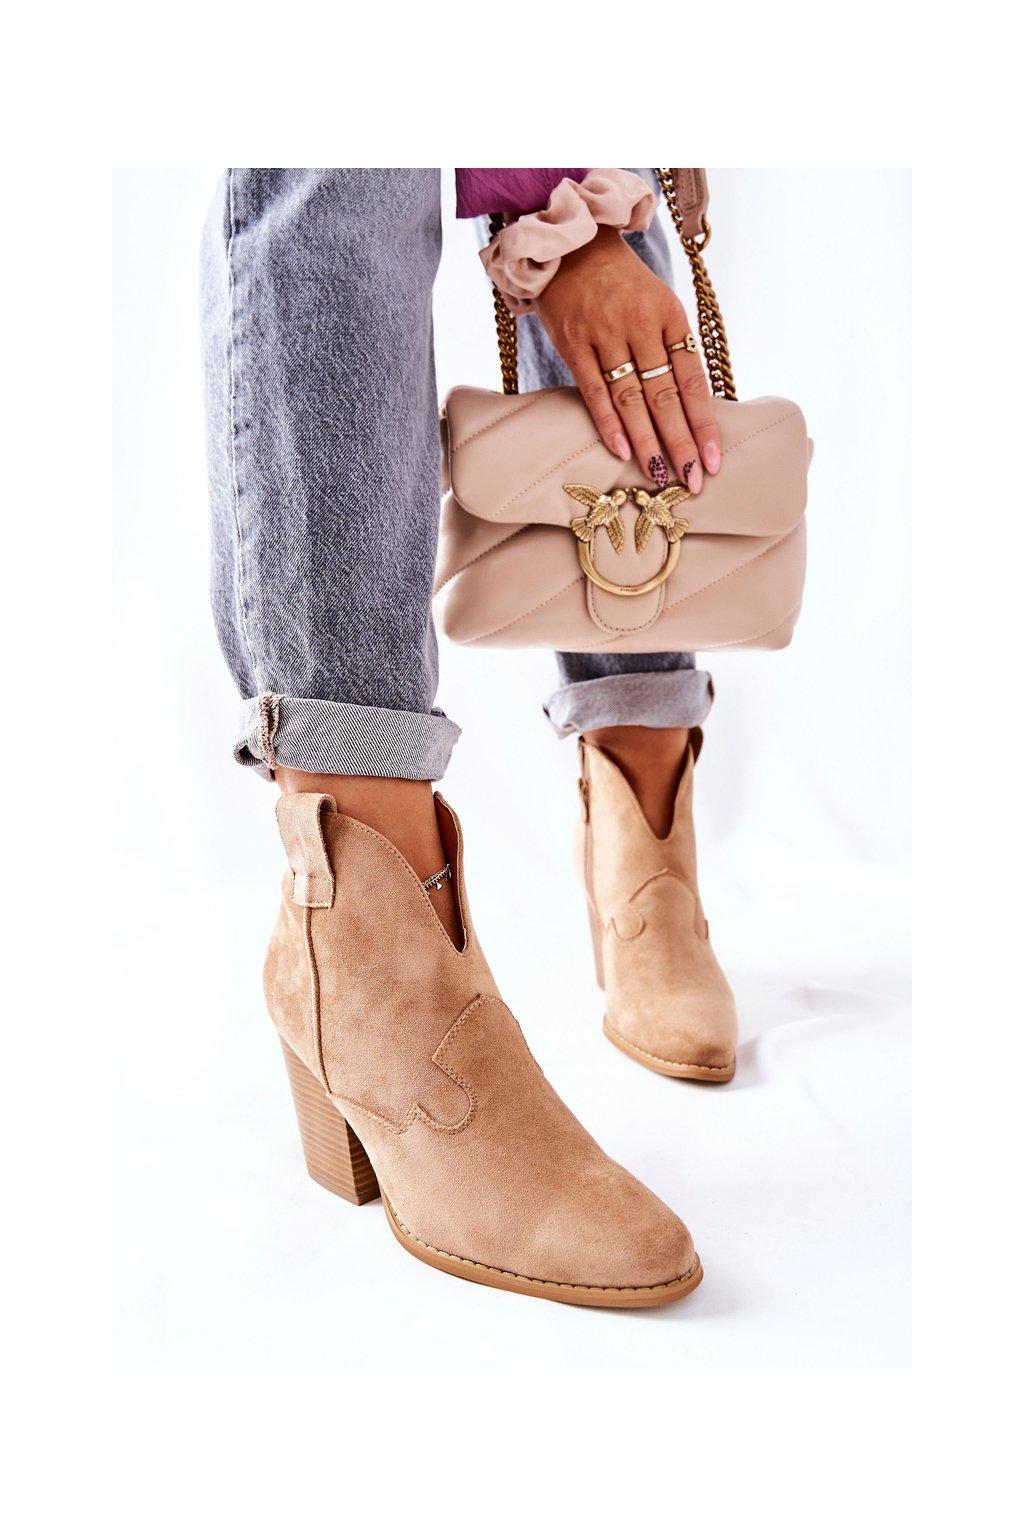 Členkové topánky na podpätku farba hnedá NJSK A5607-63 KHAKI